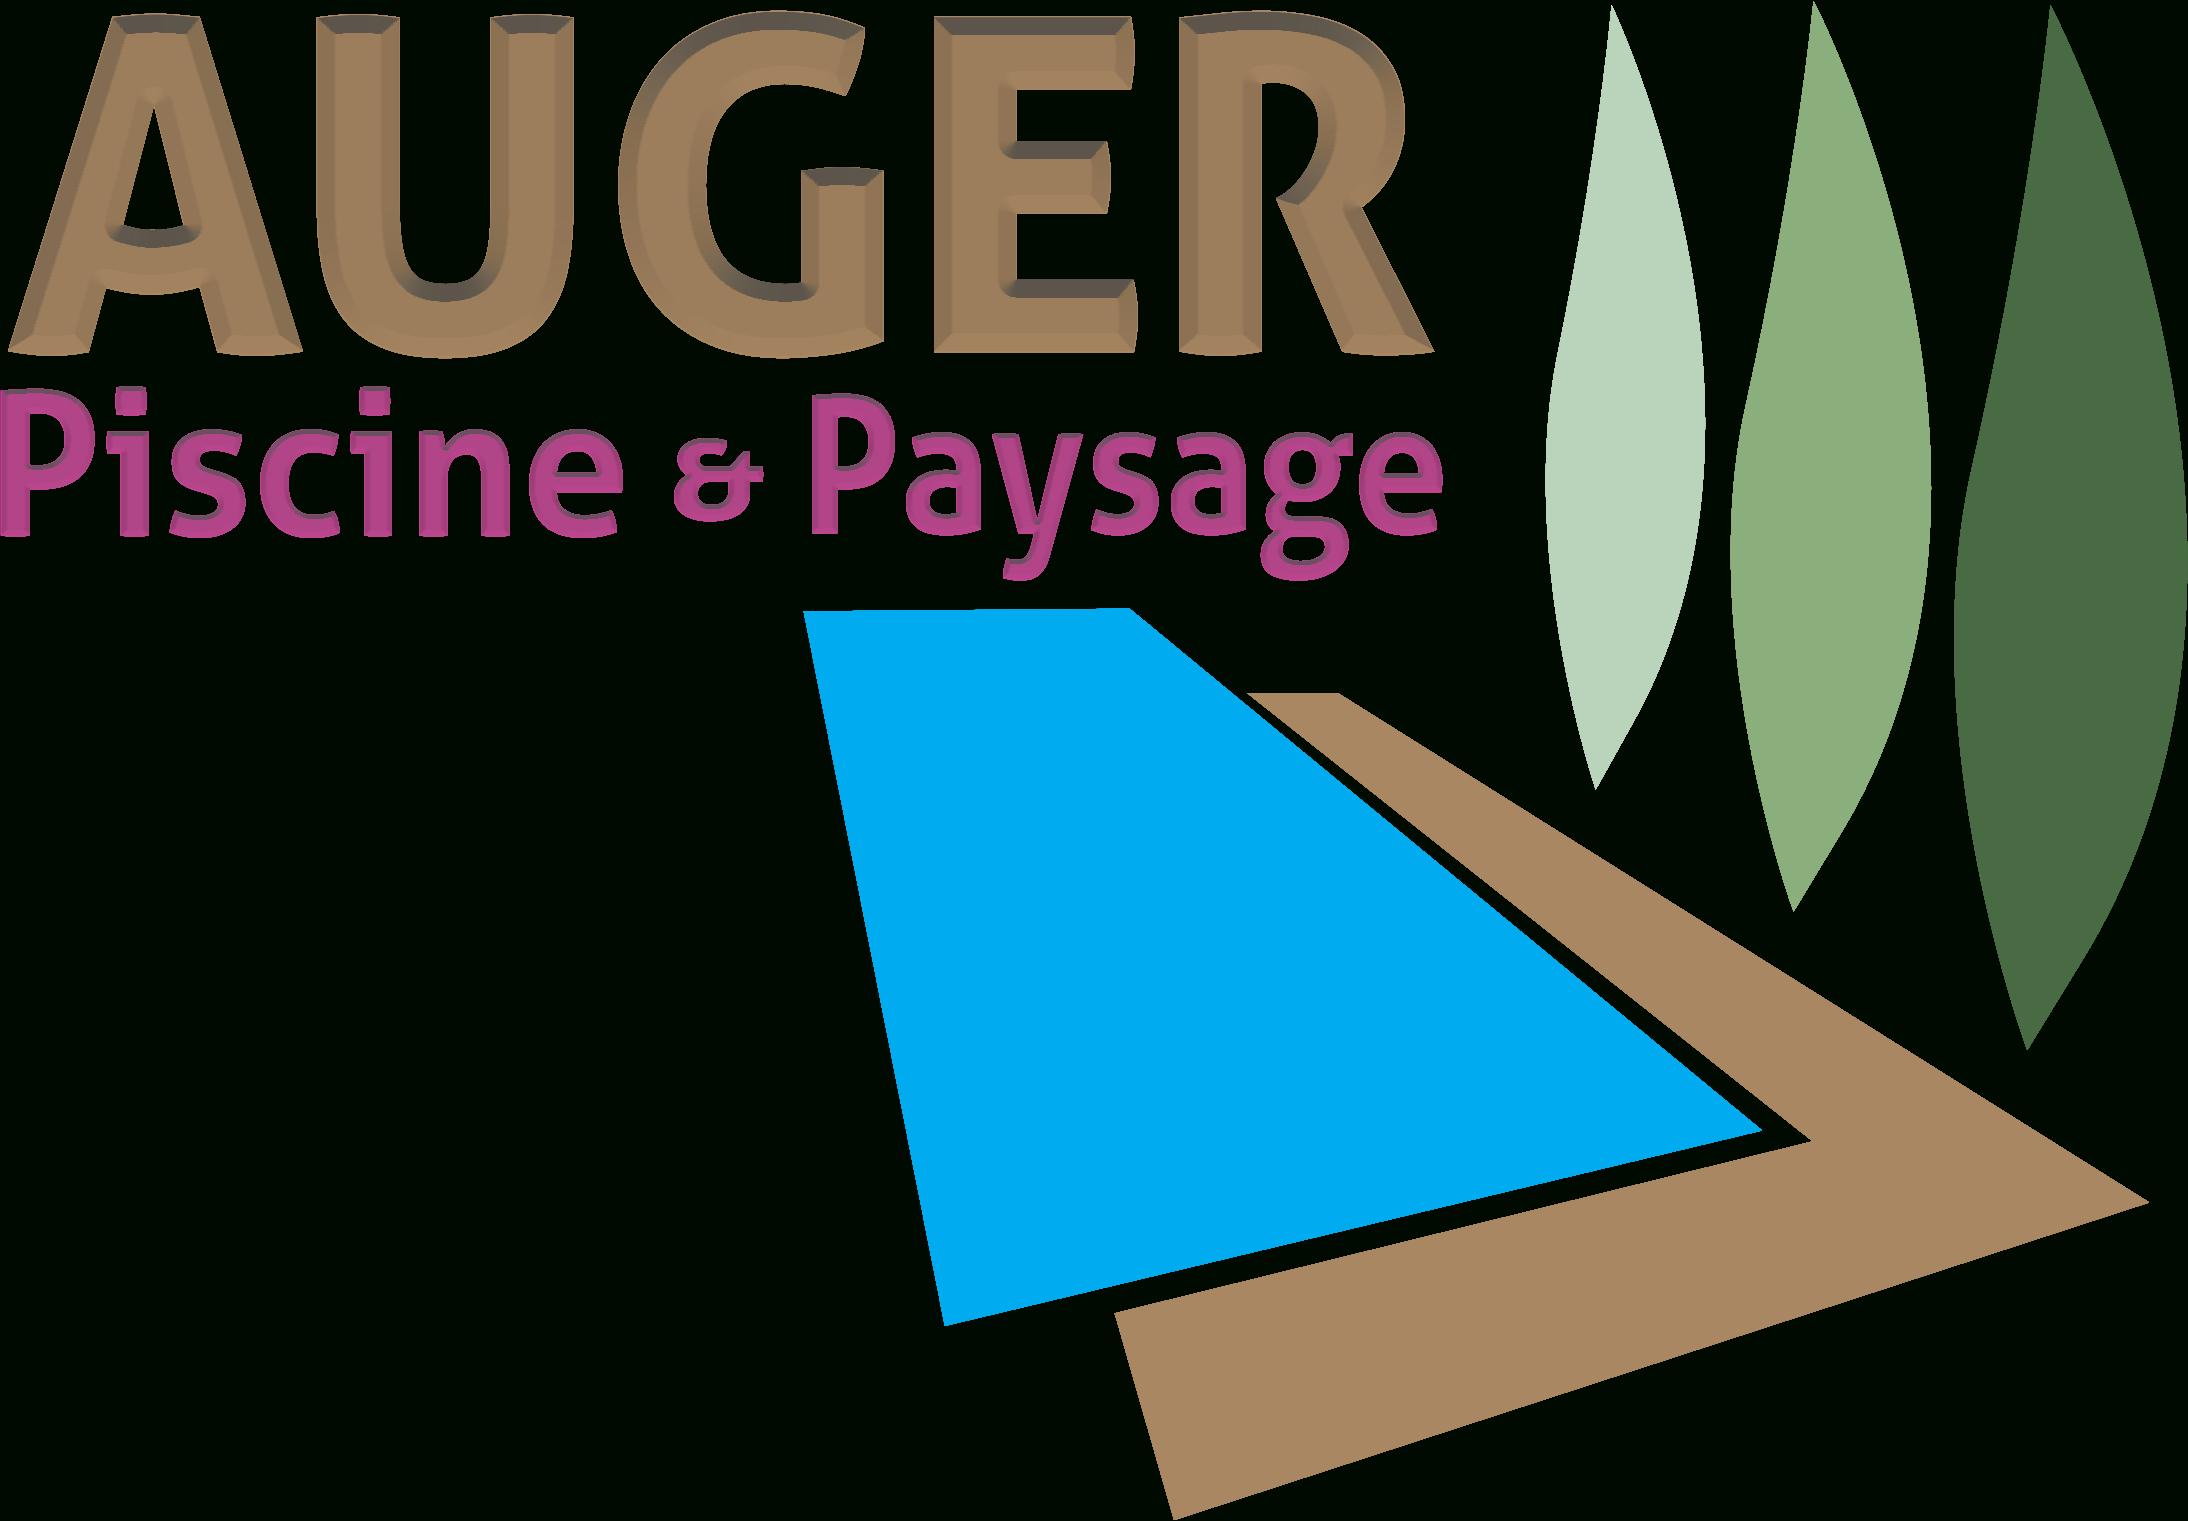 Auger Piscine Et Paysage concernant Horaire Piscine Bressuire